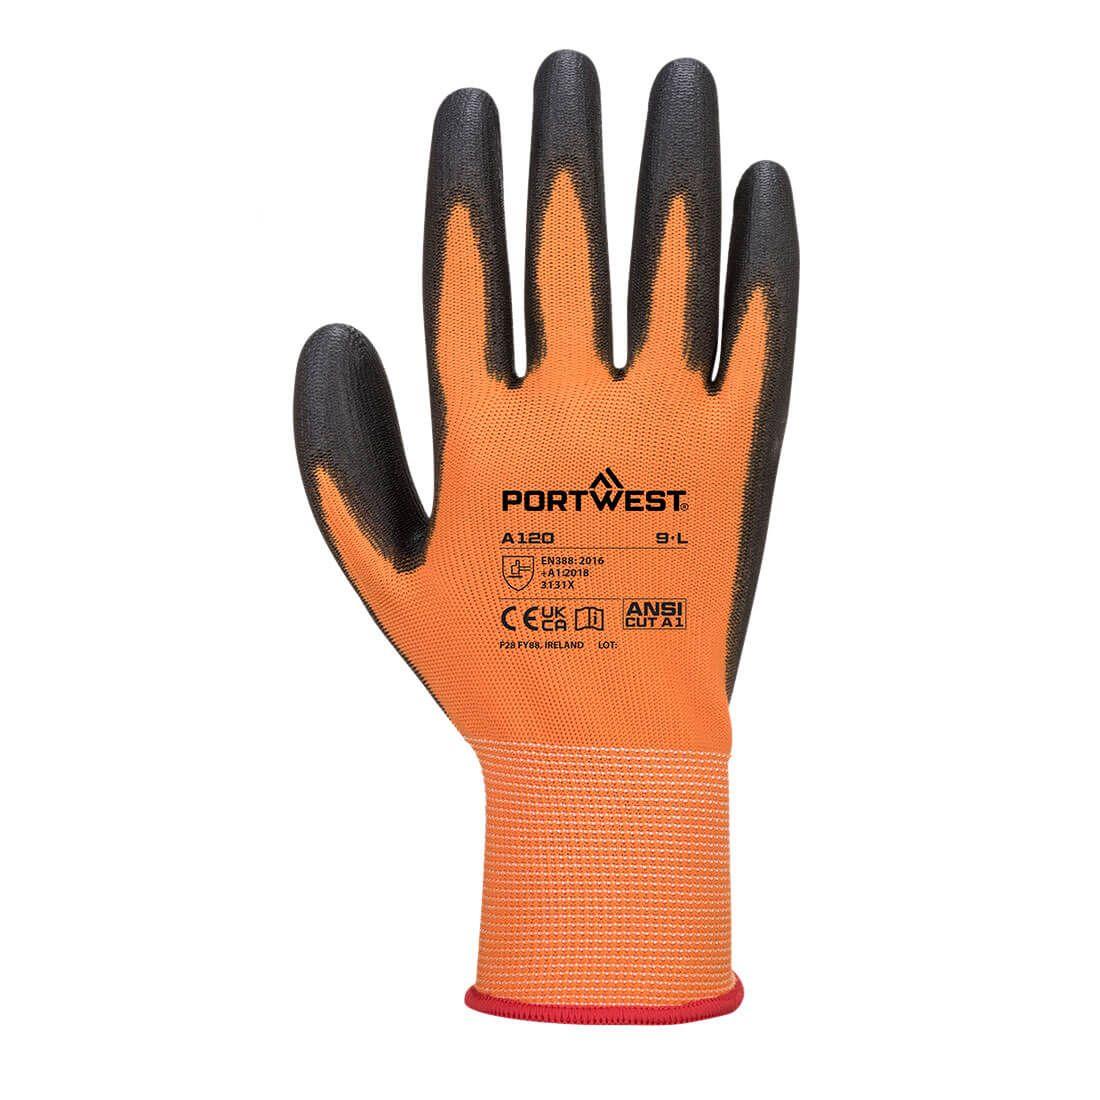 Portwest Handschoenen A120 oranje-zwart(O8)